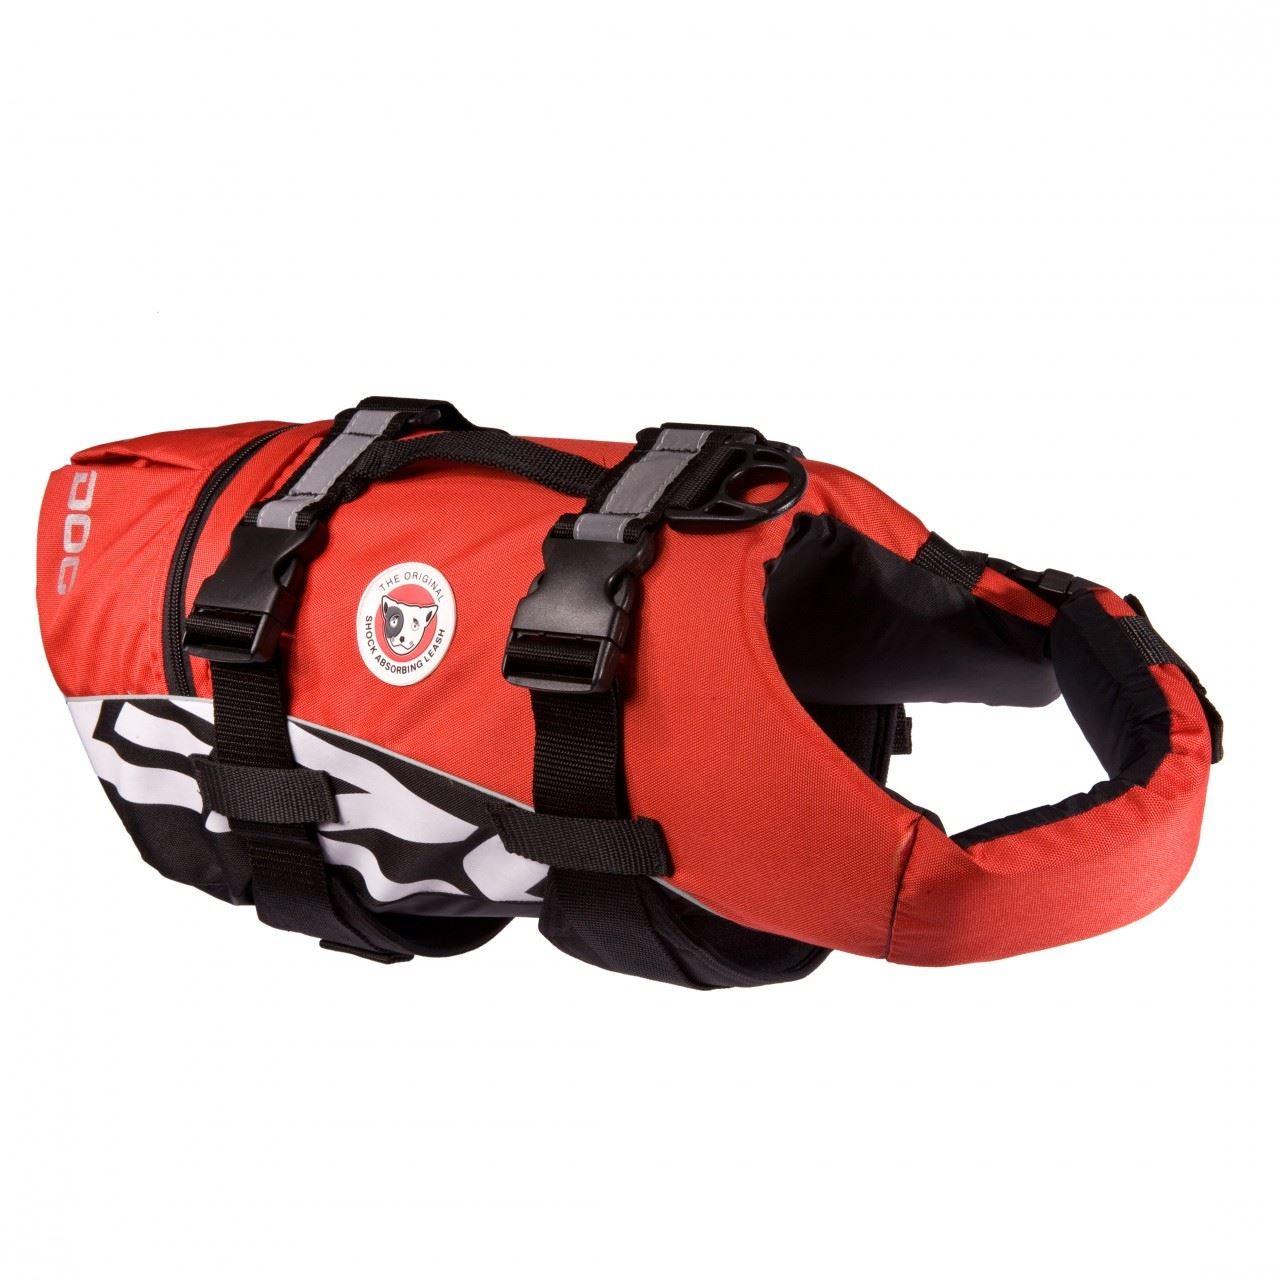 EzyDog DFD Dog Flotation Device Safe Buoyancy Aid Swim